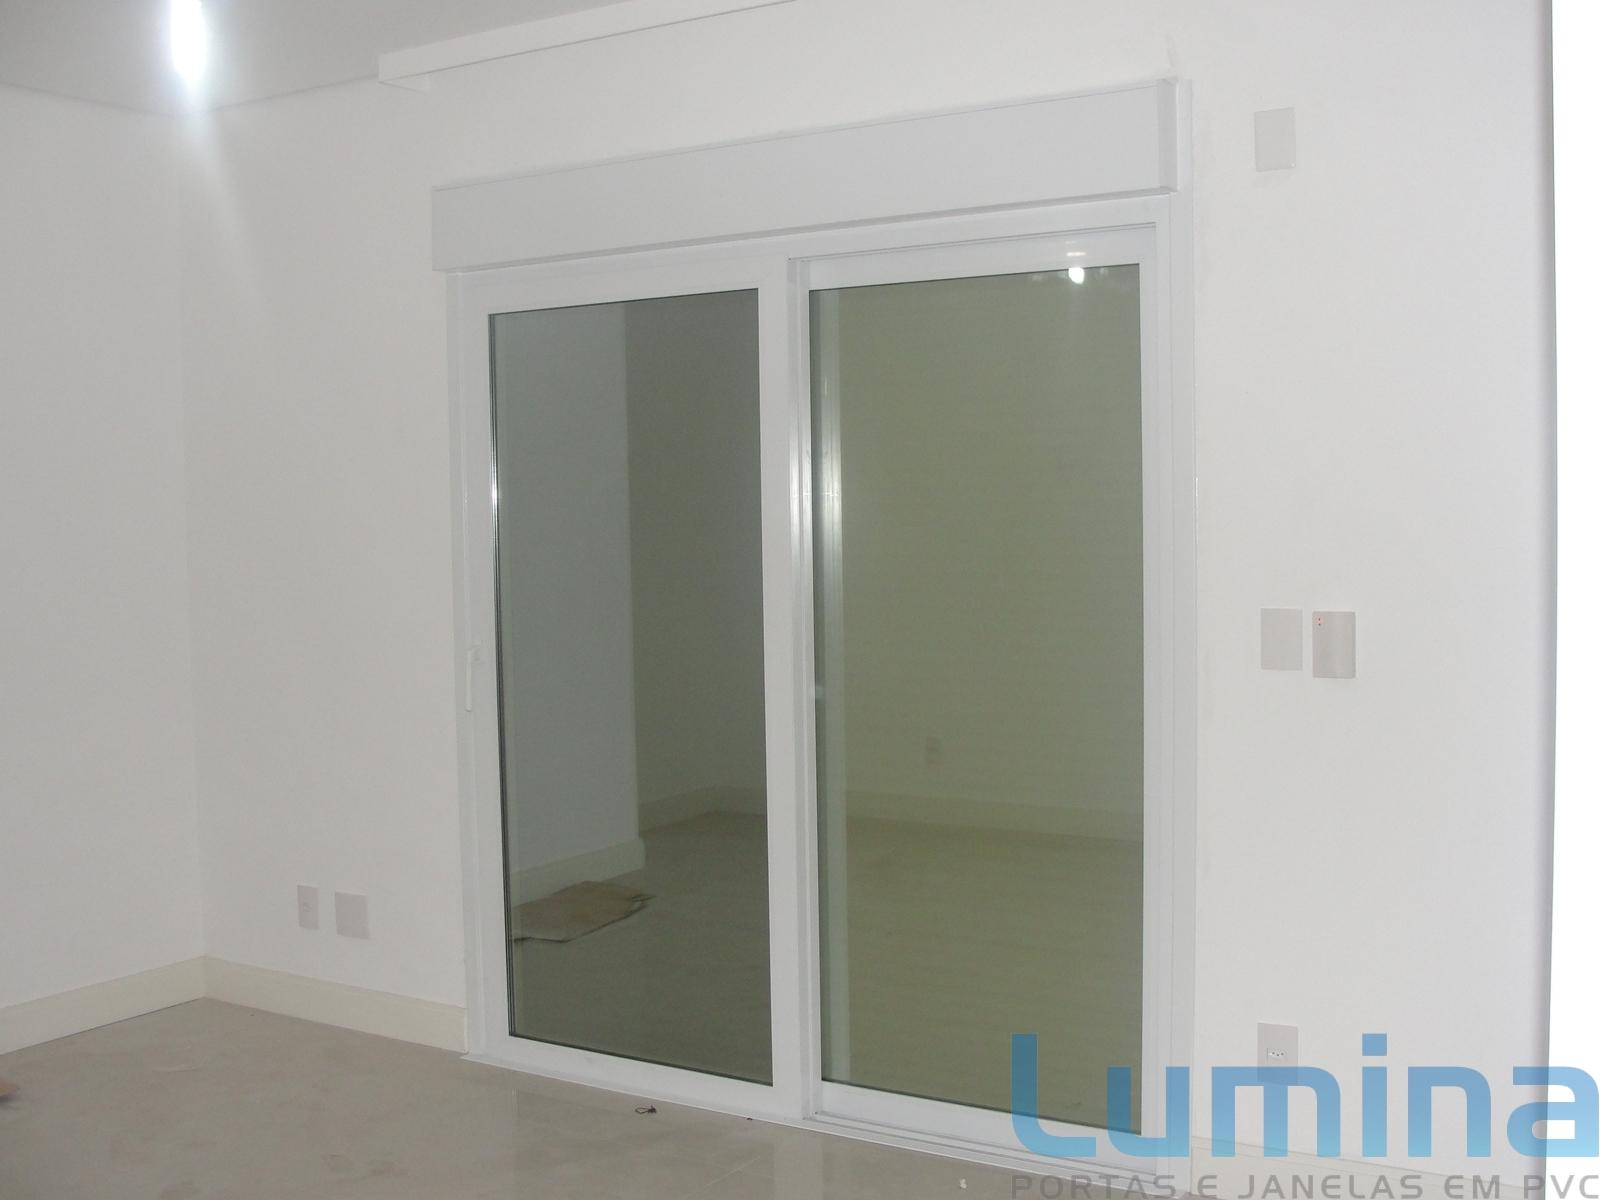 #3C6F8F Lumina PVC Portas e Janelas Tudo em esquadrias em PVC: Persianas  1212 Portas E Janelas De Pvc Ou Aluminio